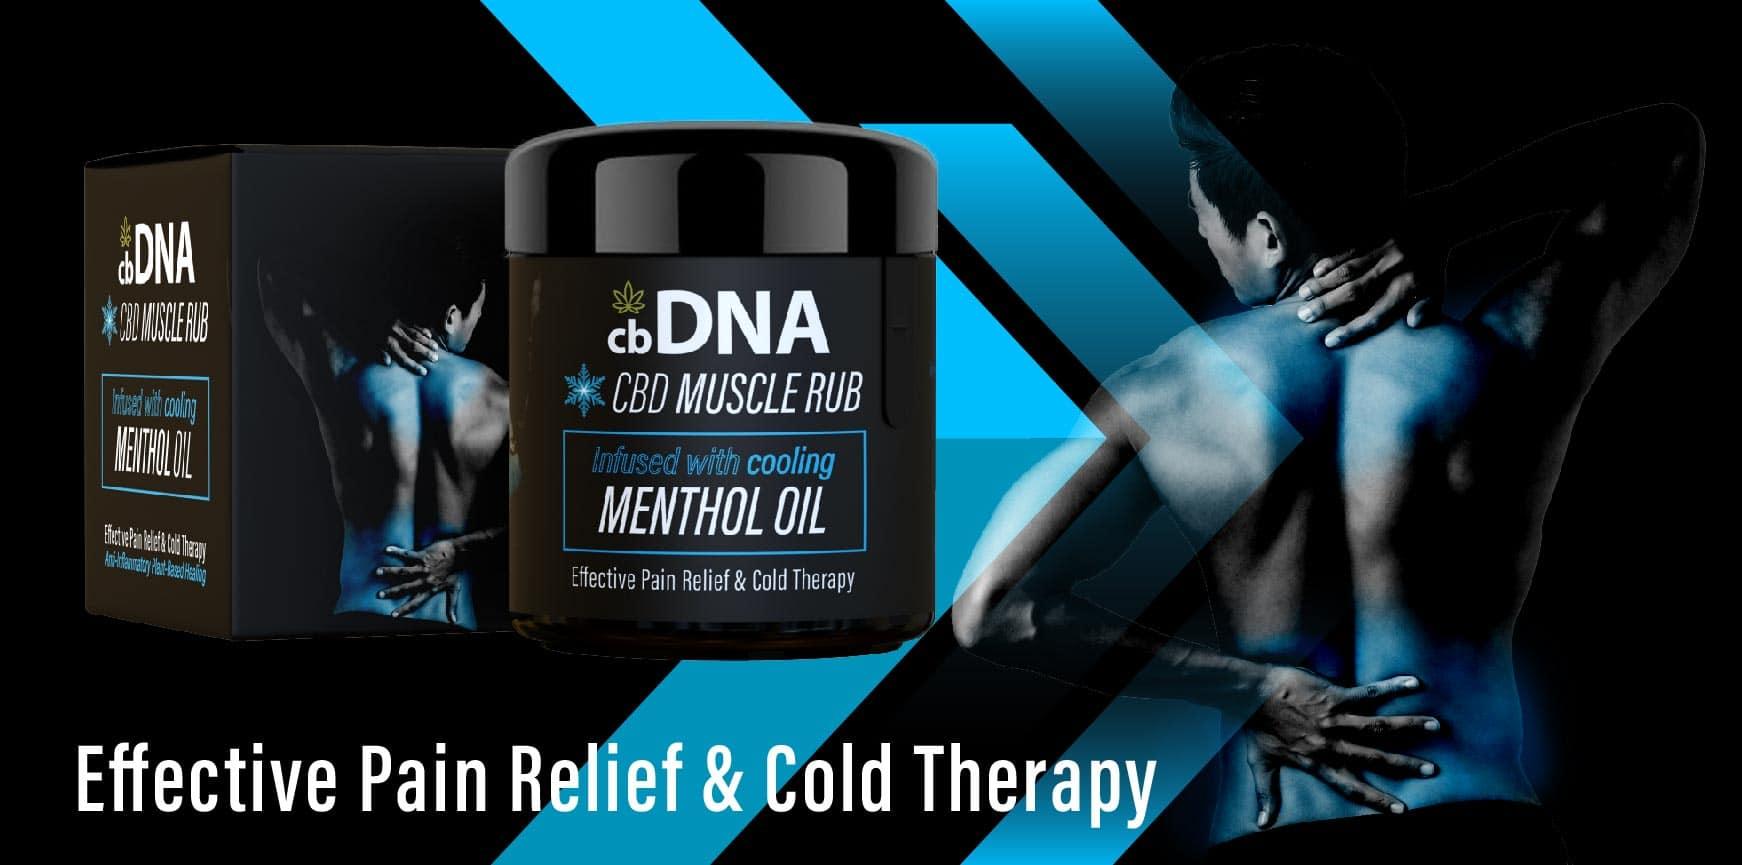 CBDNA Menthol Balm Mobile 04